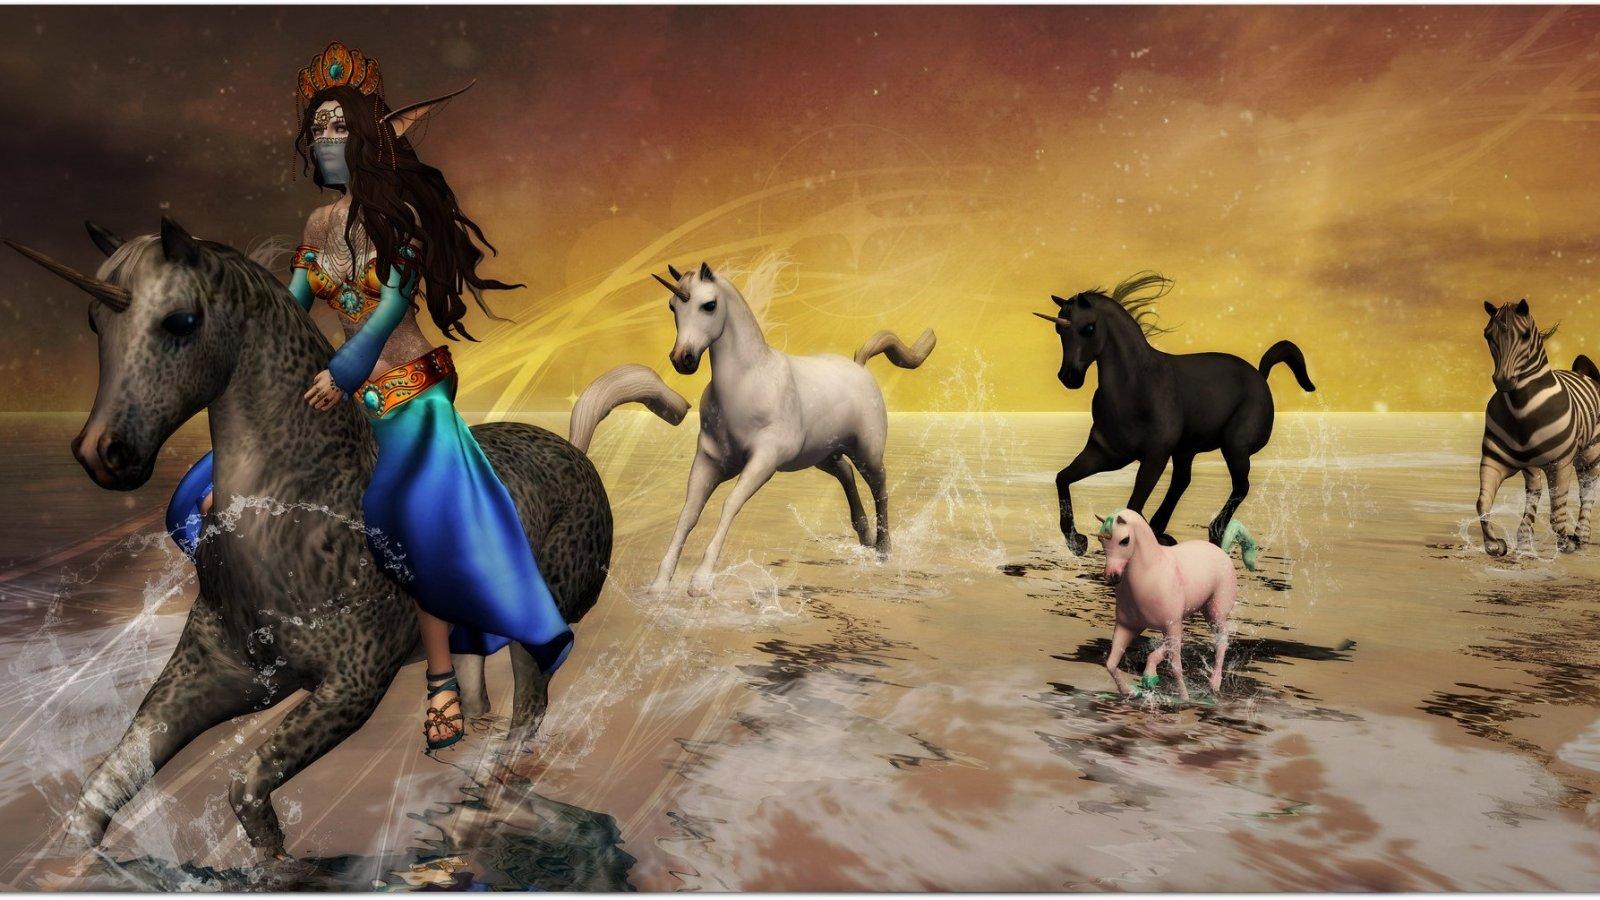 Kalina's Ride